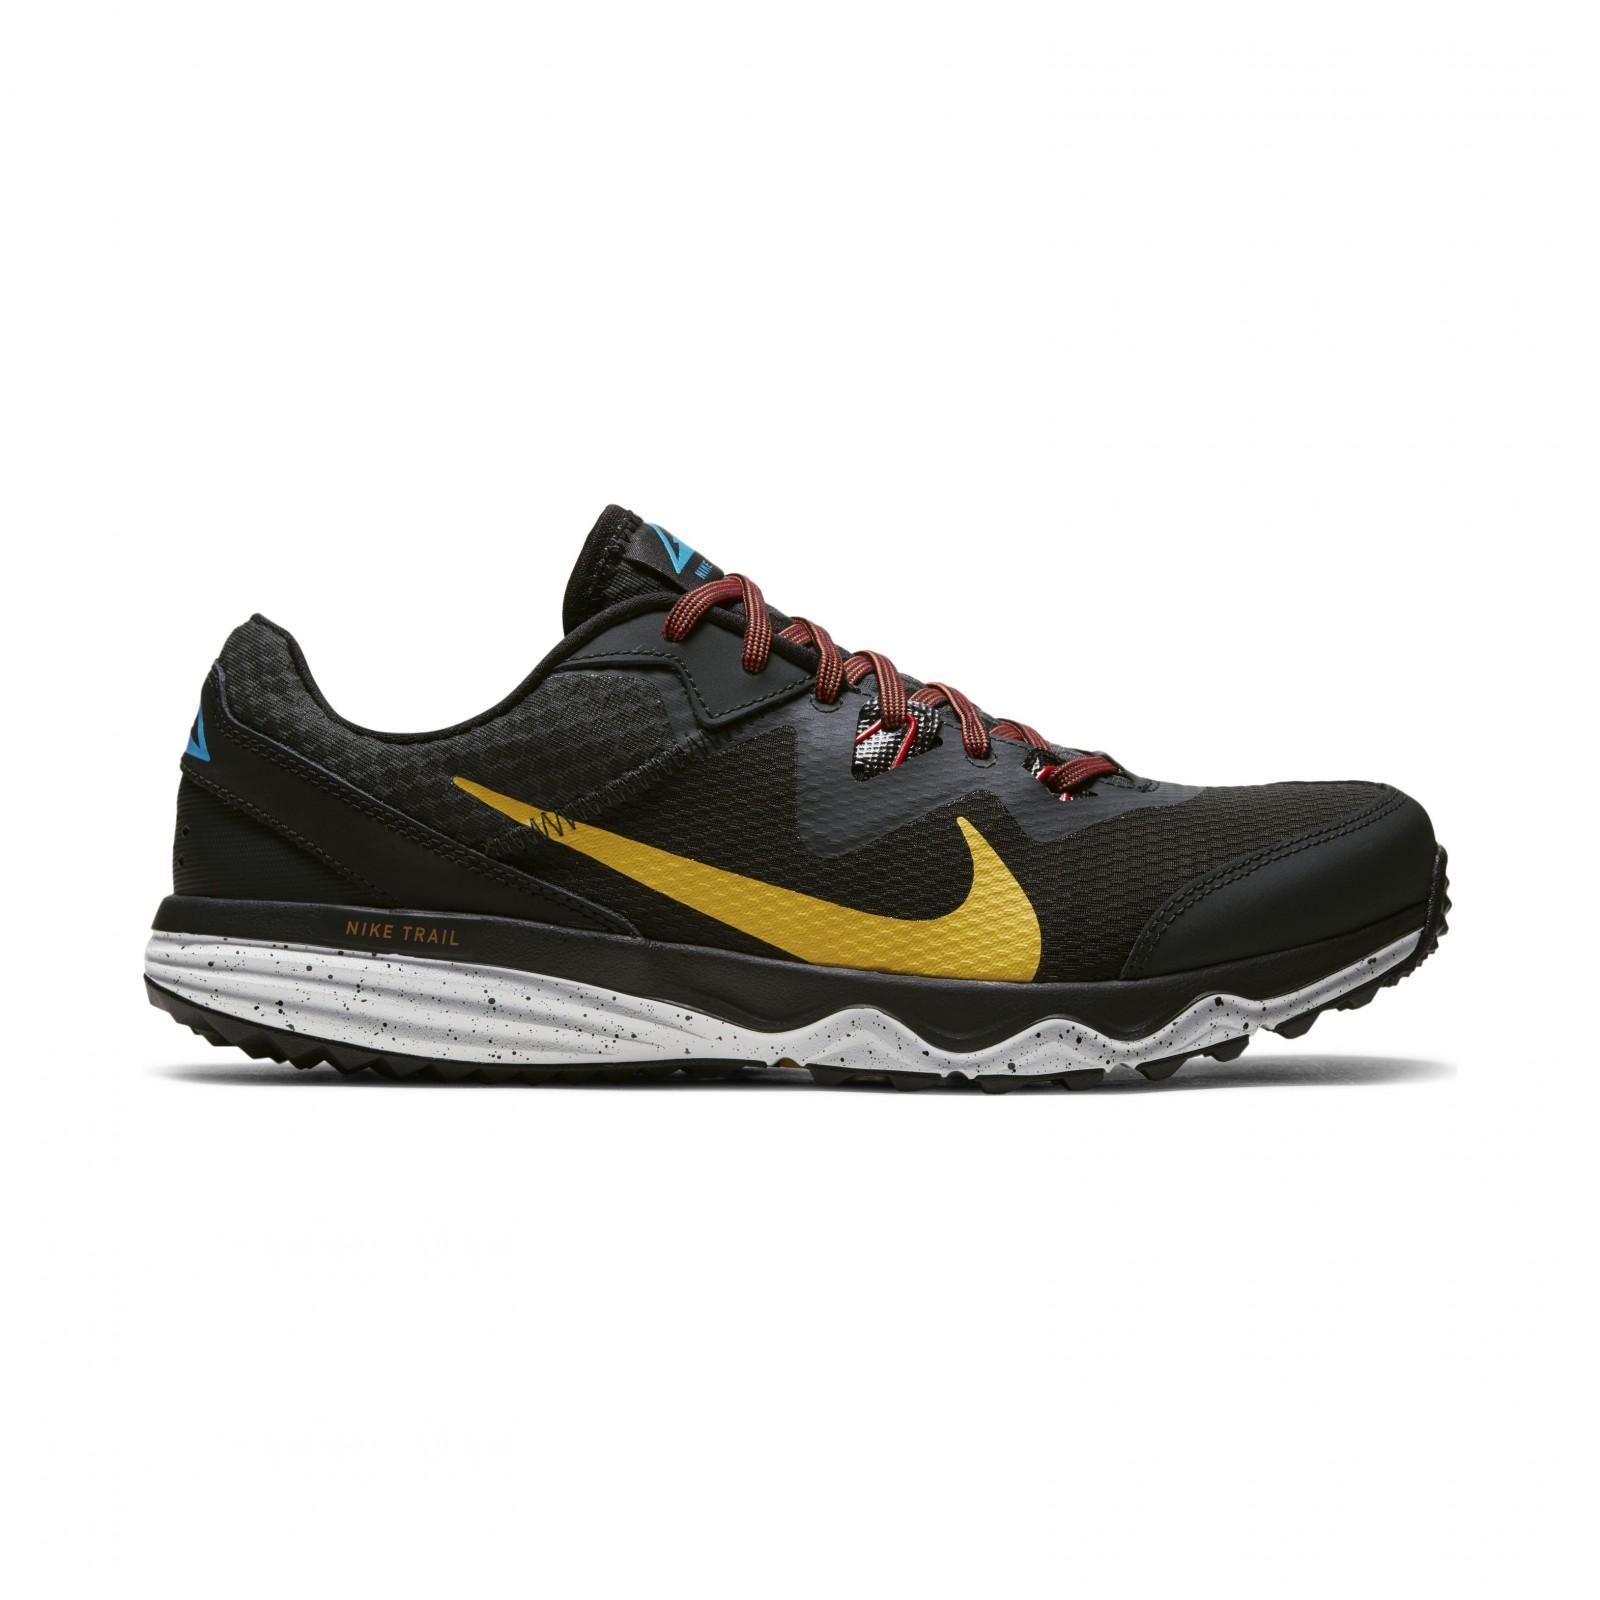 Nike Juniper Trail OFF NOIR/DARK SULFUR-BLACK-PURE PLATINUM